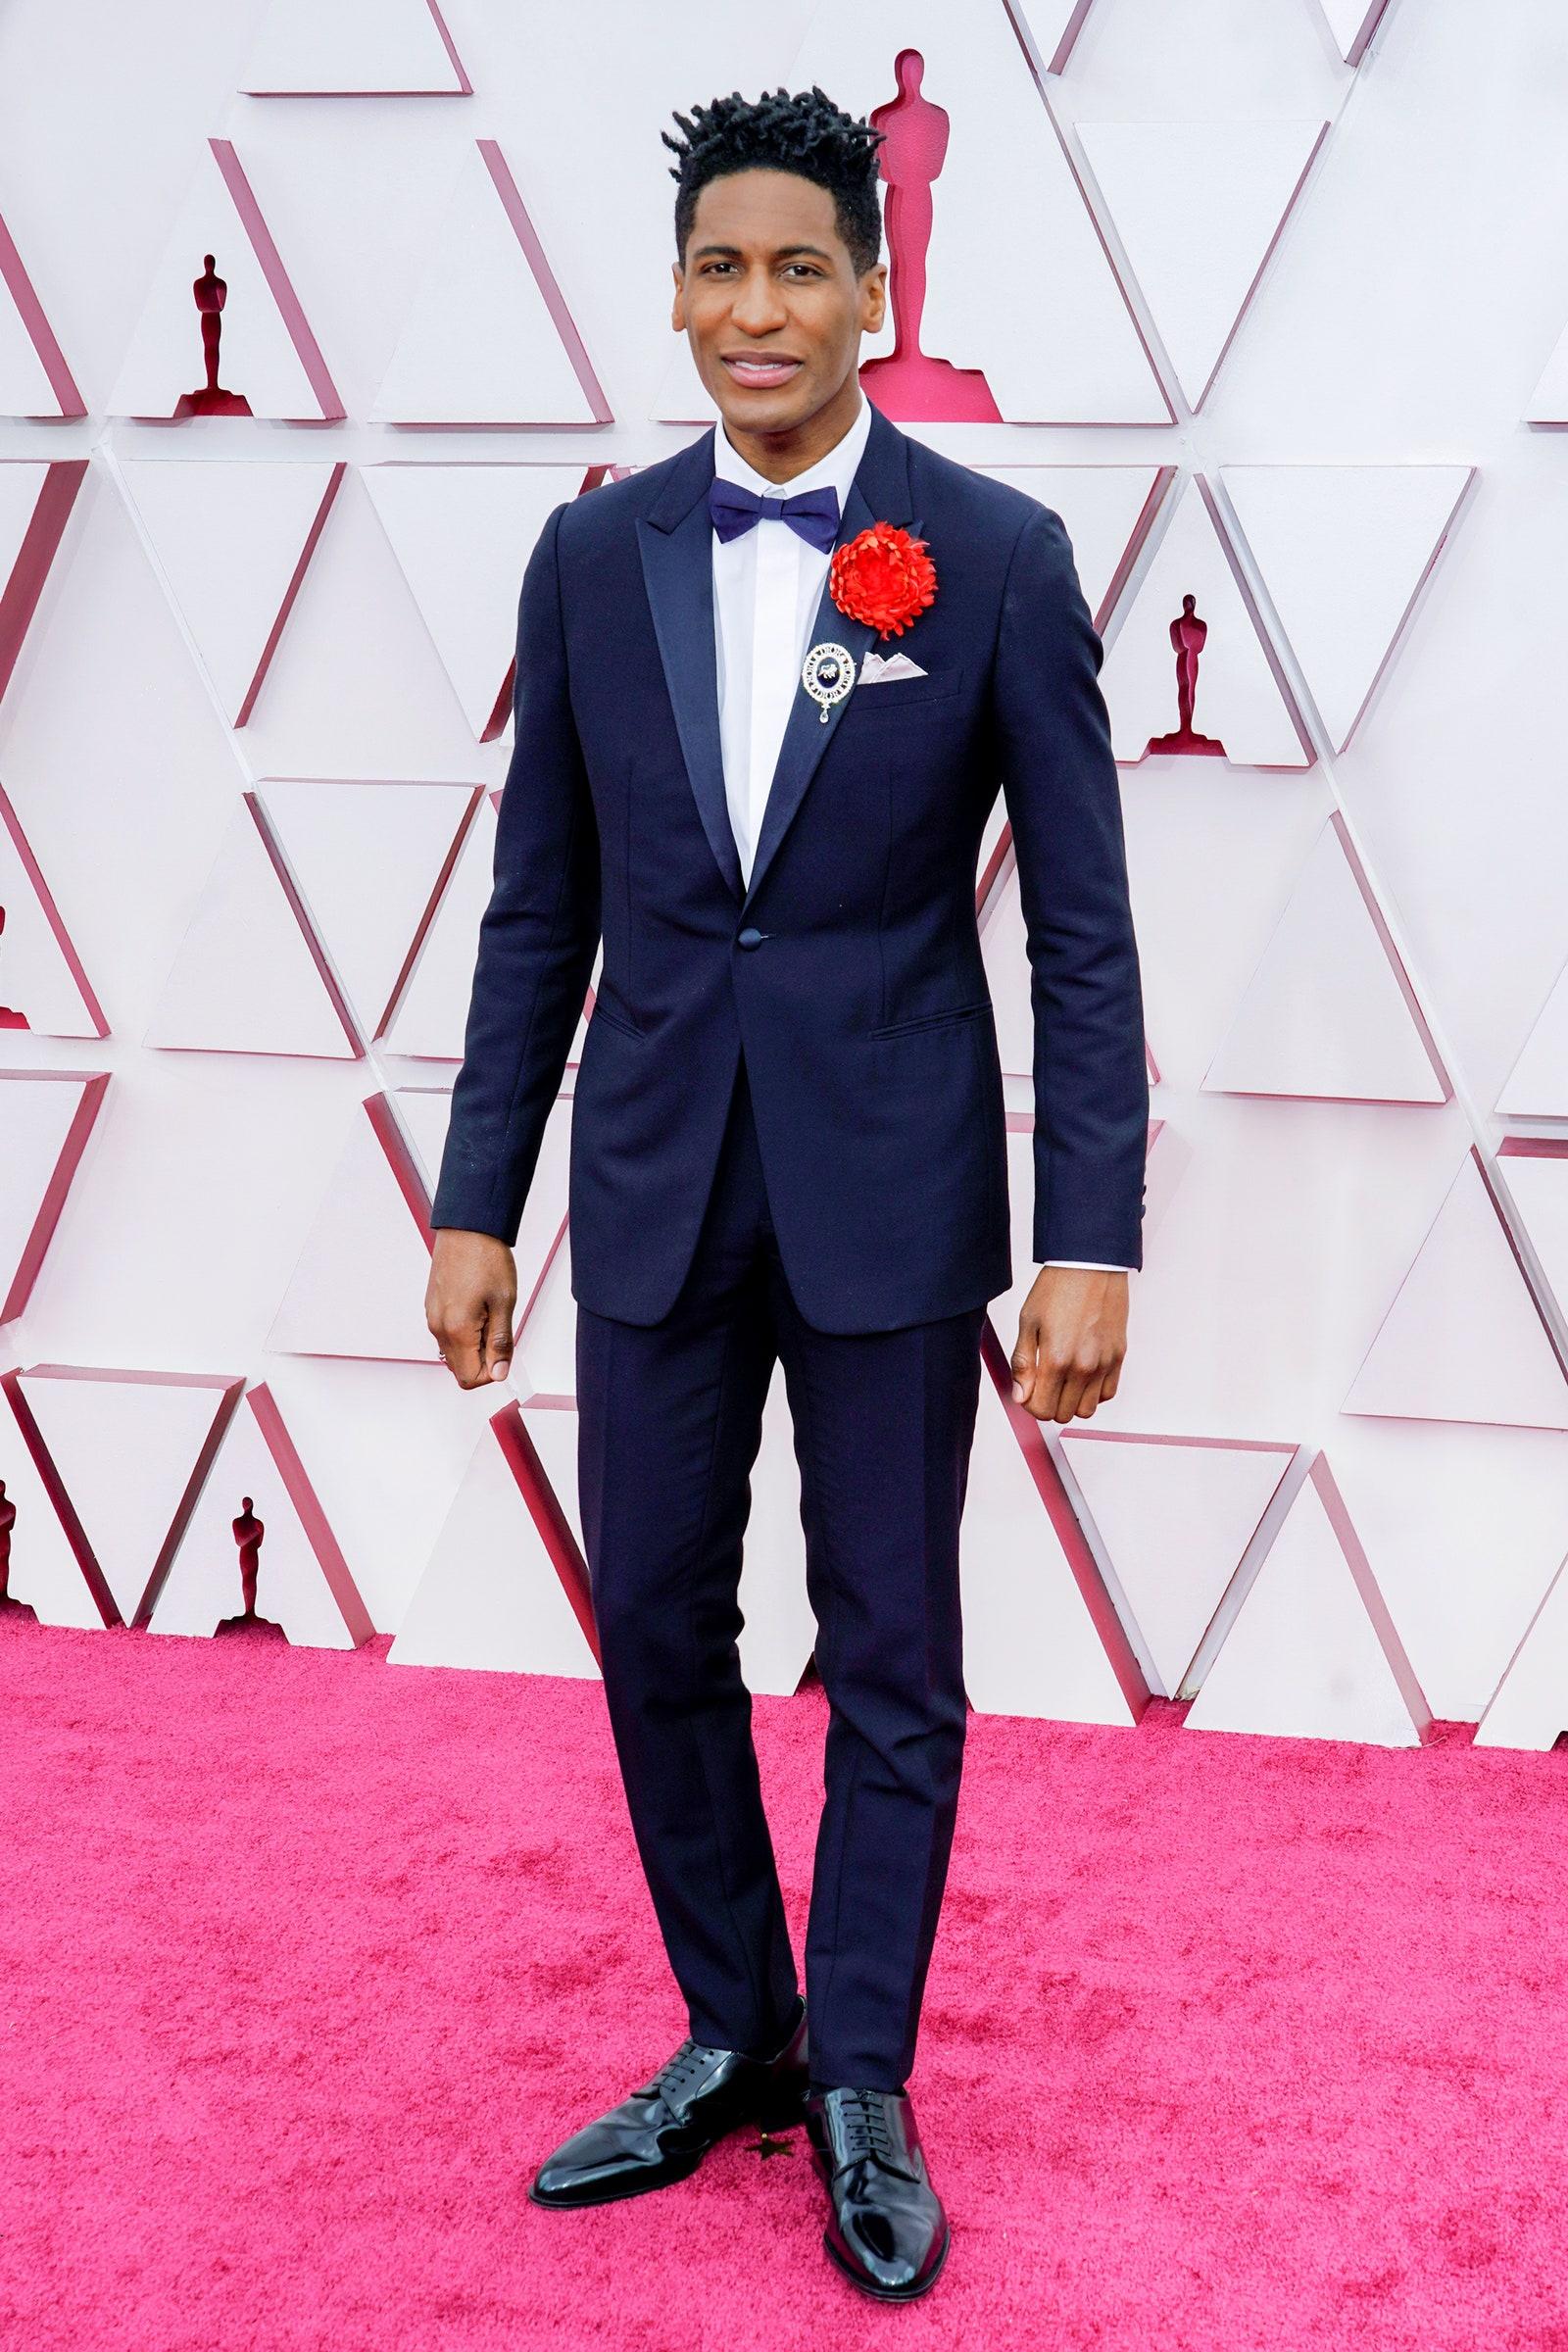 Оскар 2021: Улаан хивсний ёслолоос